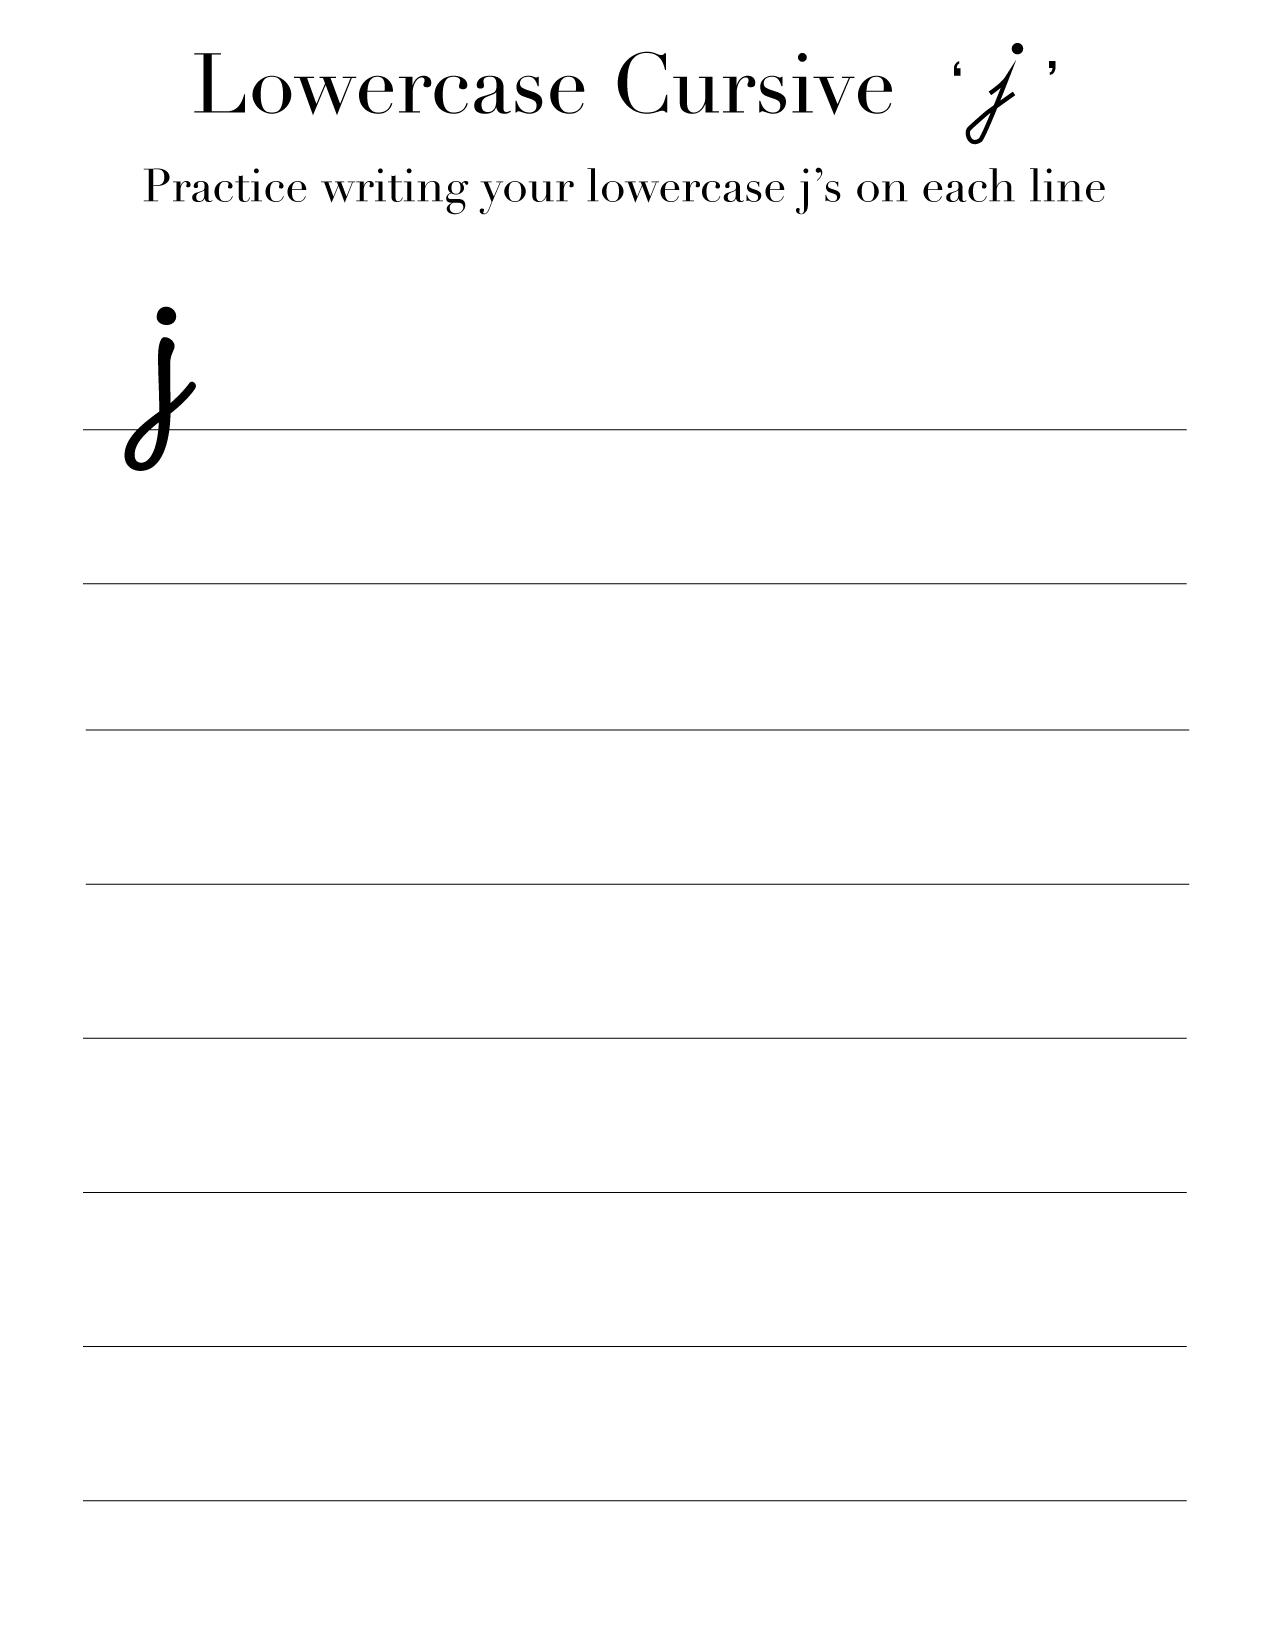 Lowercase Cursive j